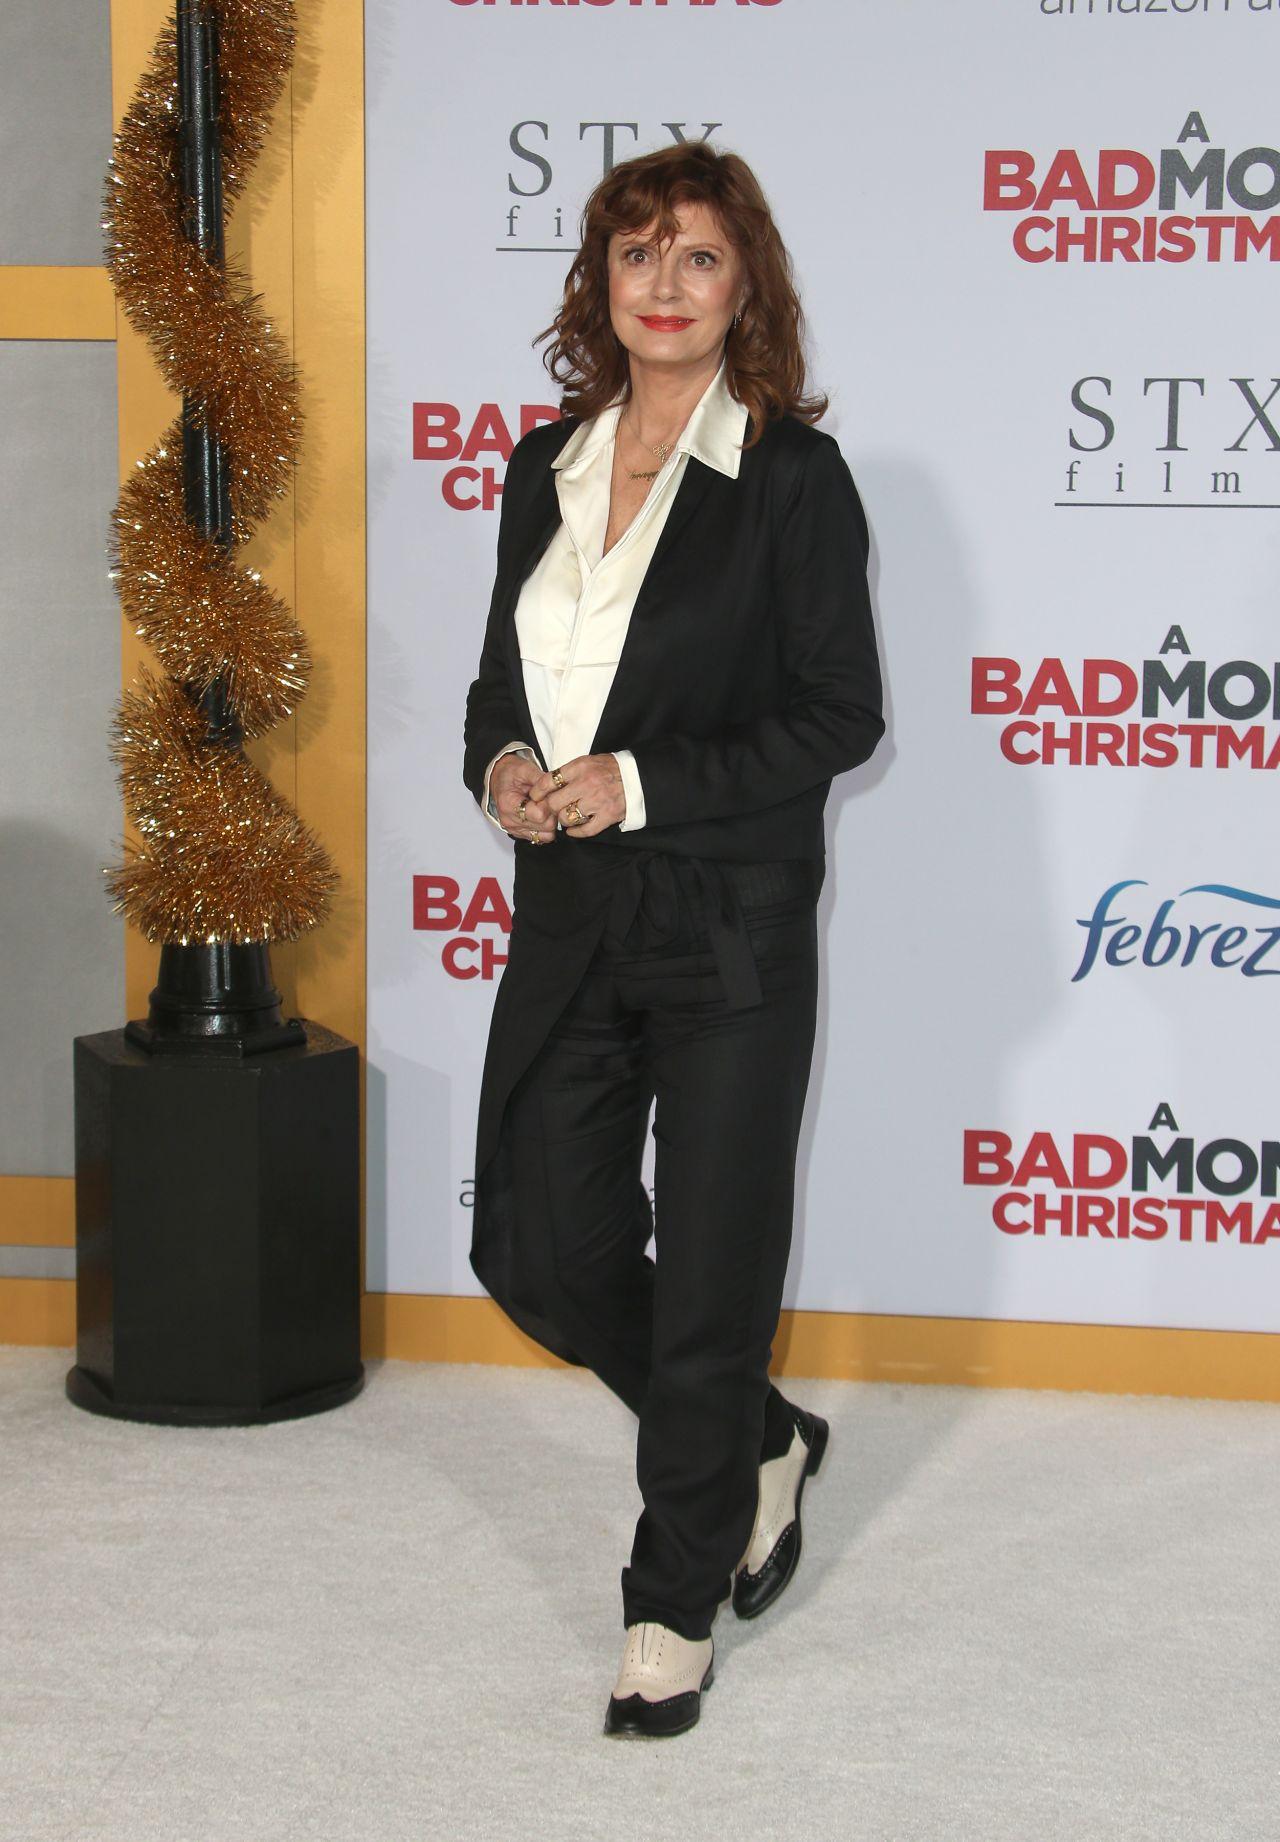 Bad Moms Christmas Susan Sarandon.Susan Sarandon A Bad Moms Christmas Premiere In Westwood